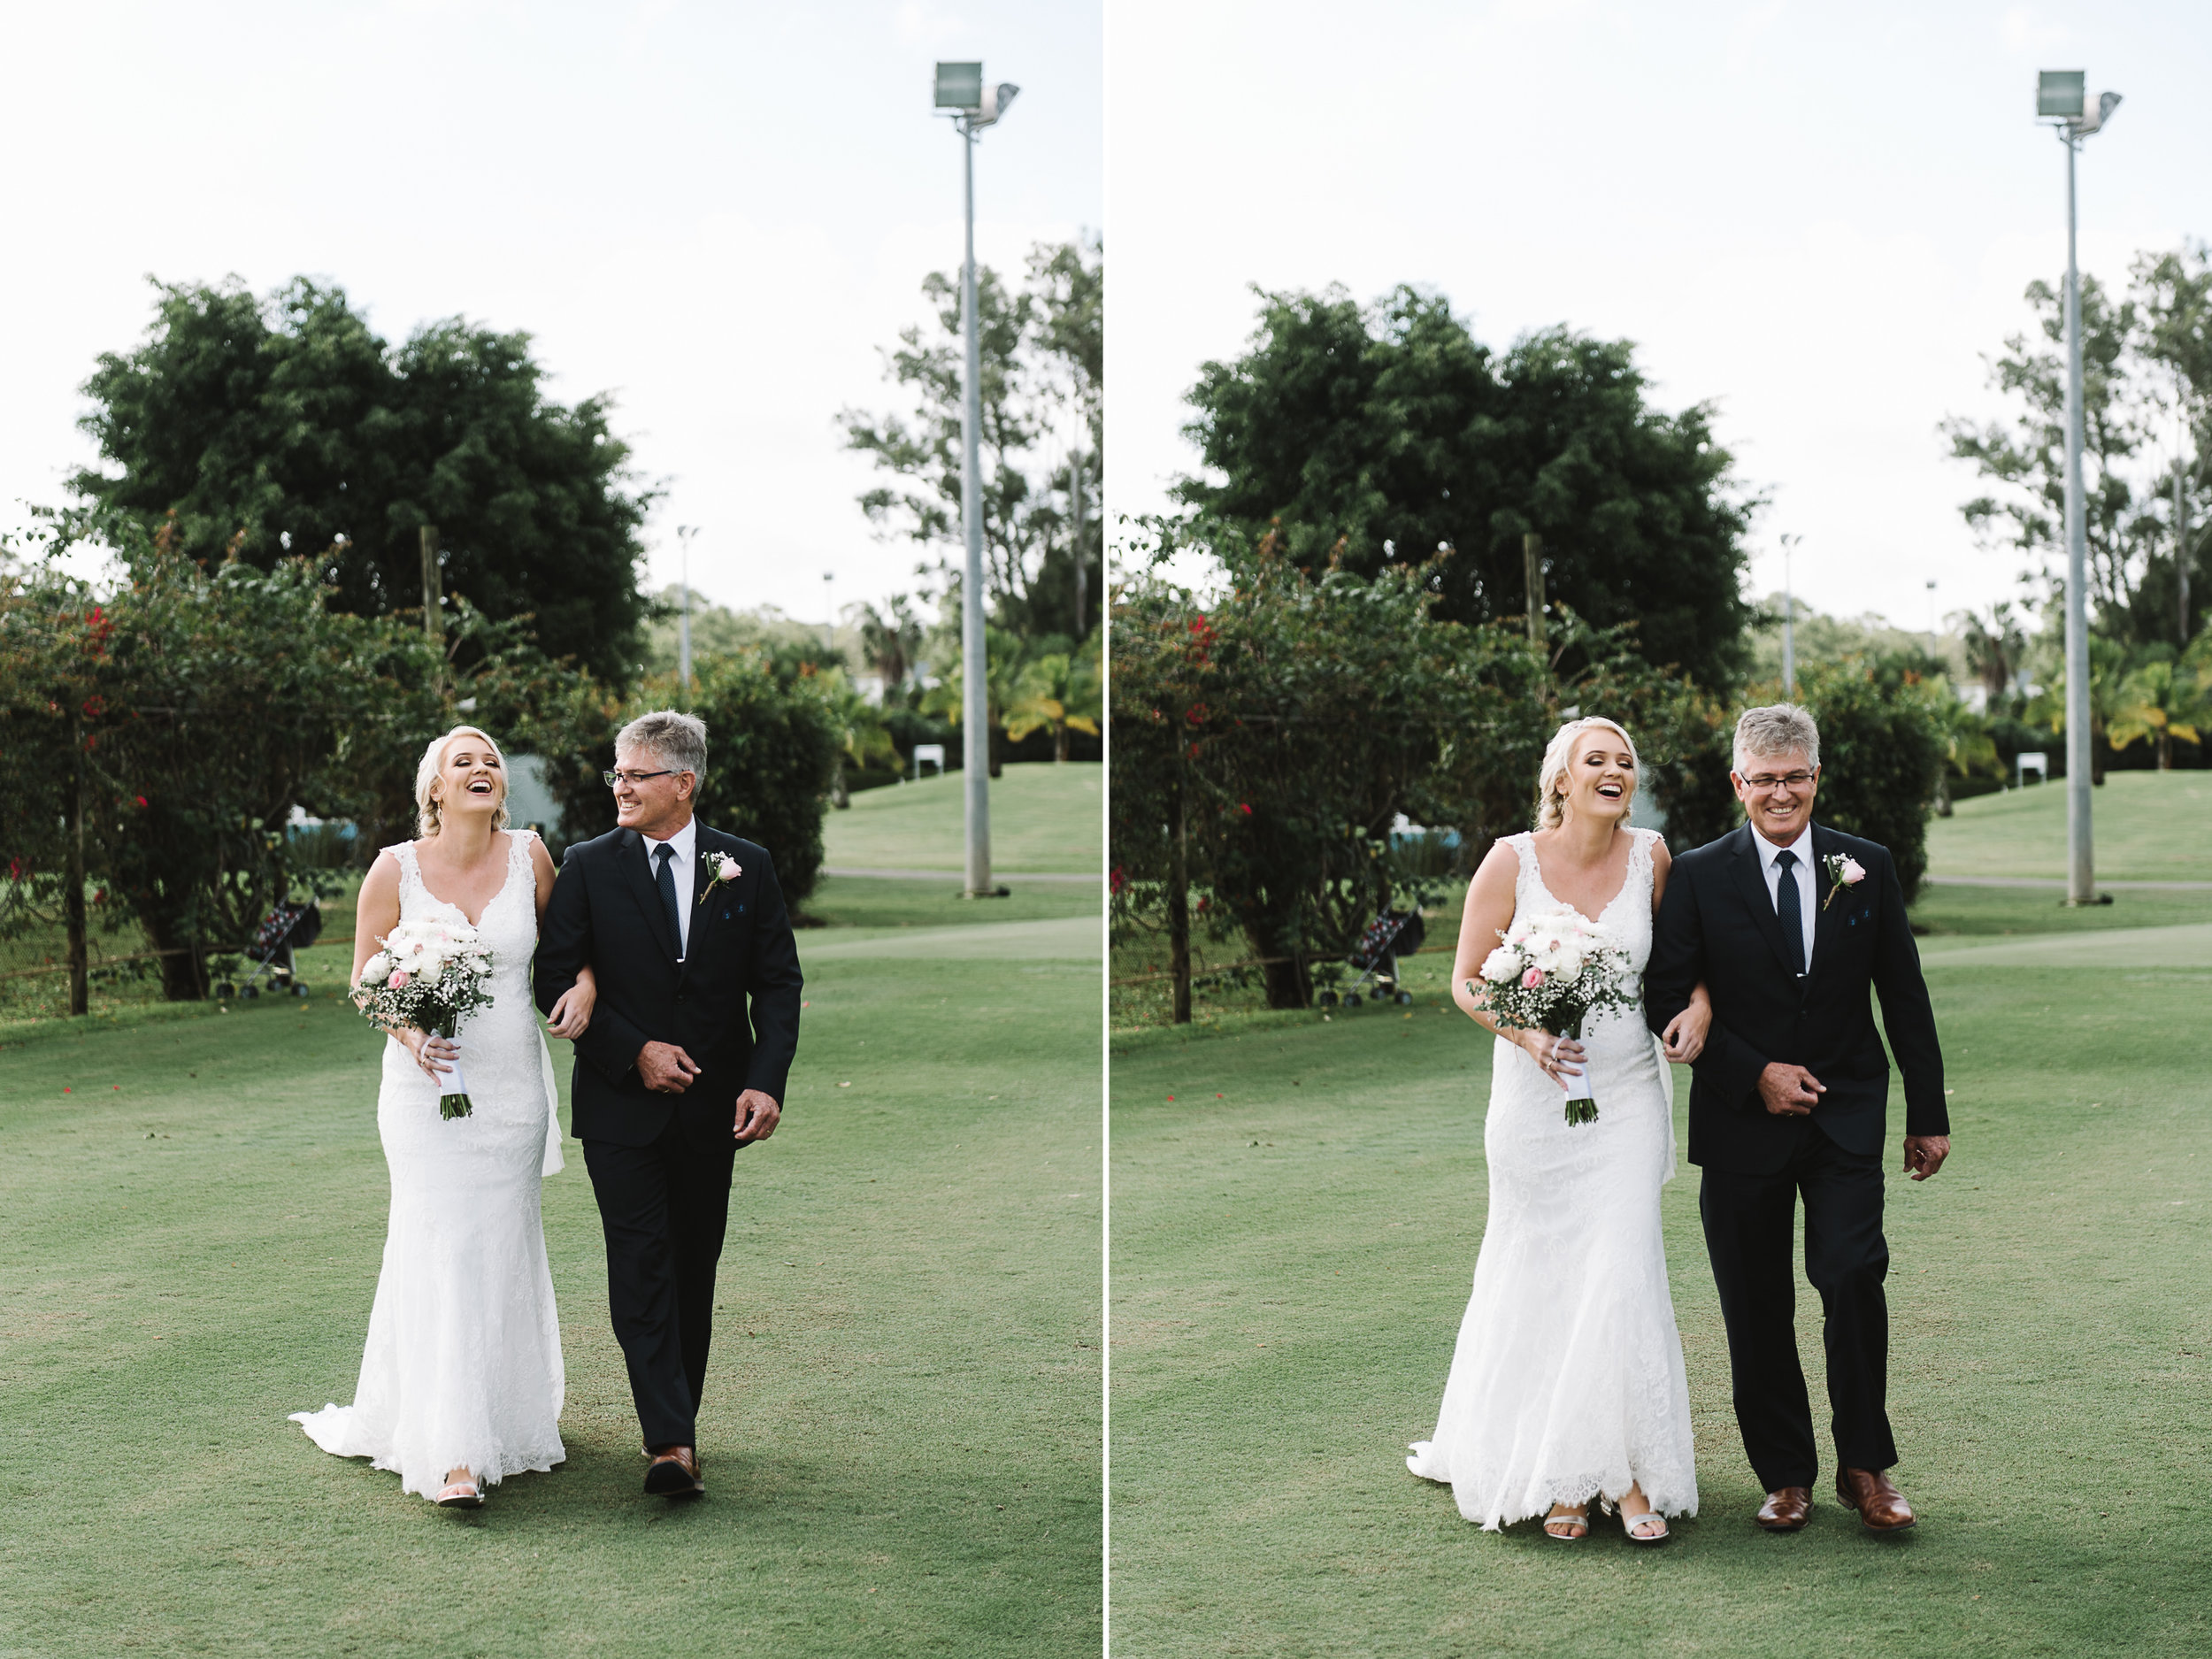 Brisbane-wedding-photography-16.jpg